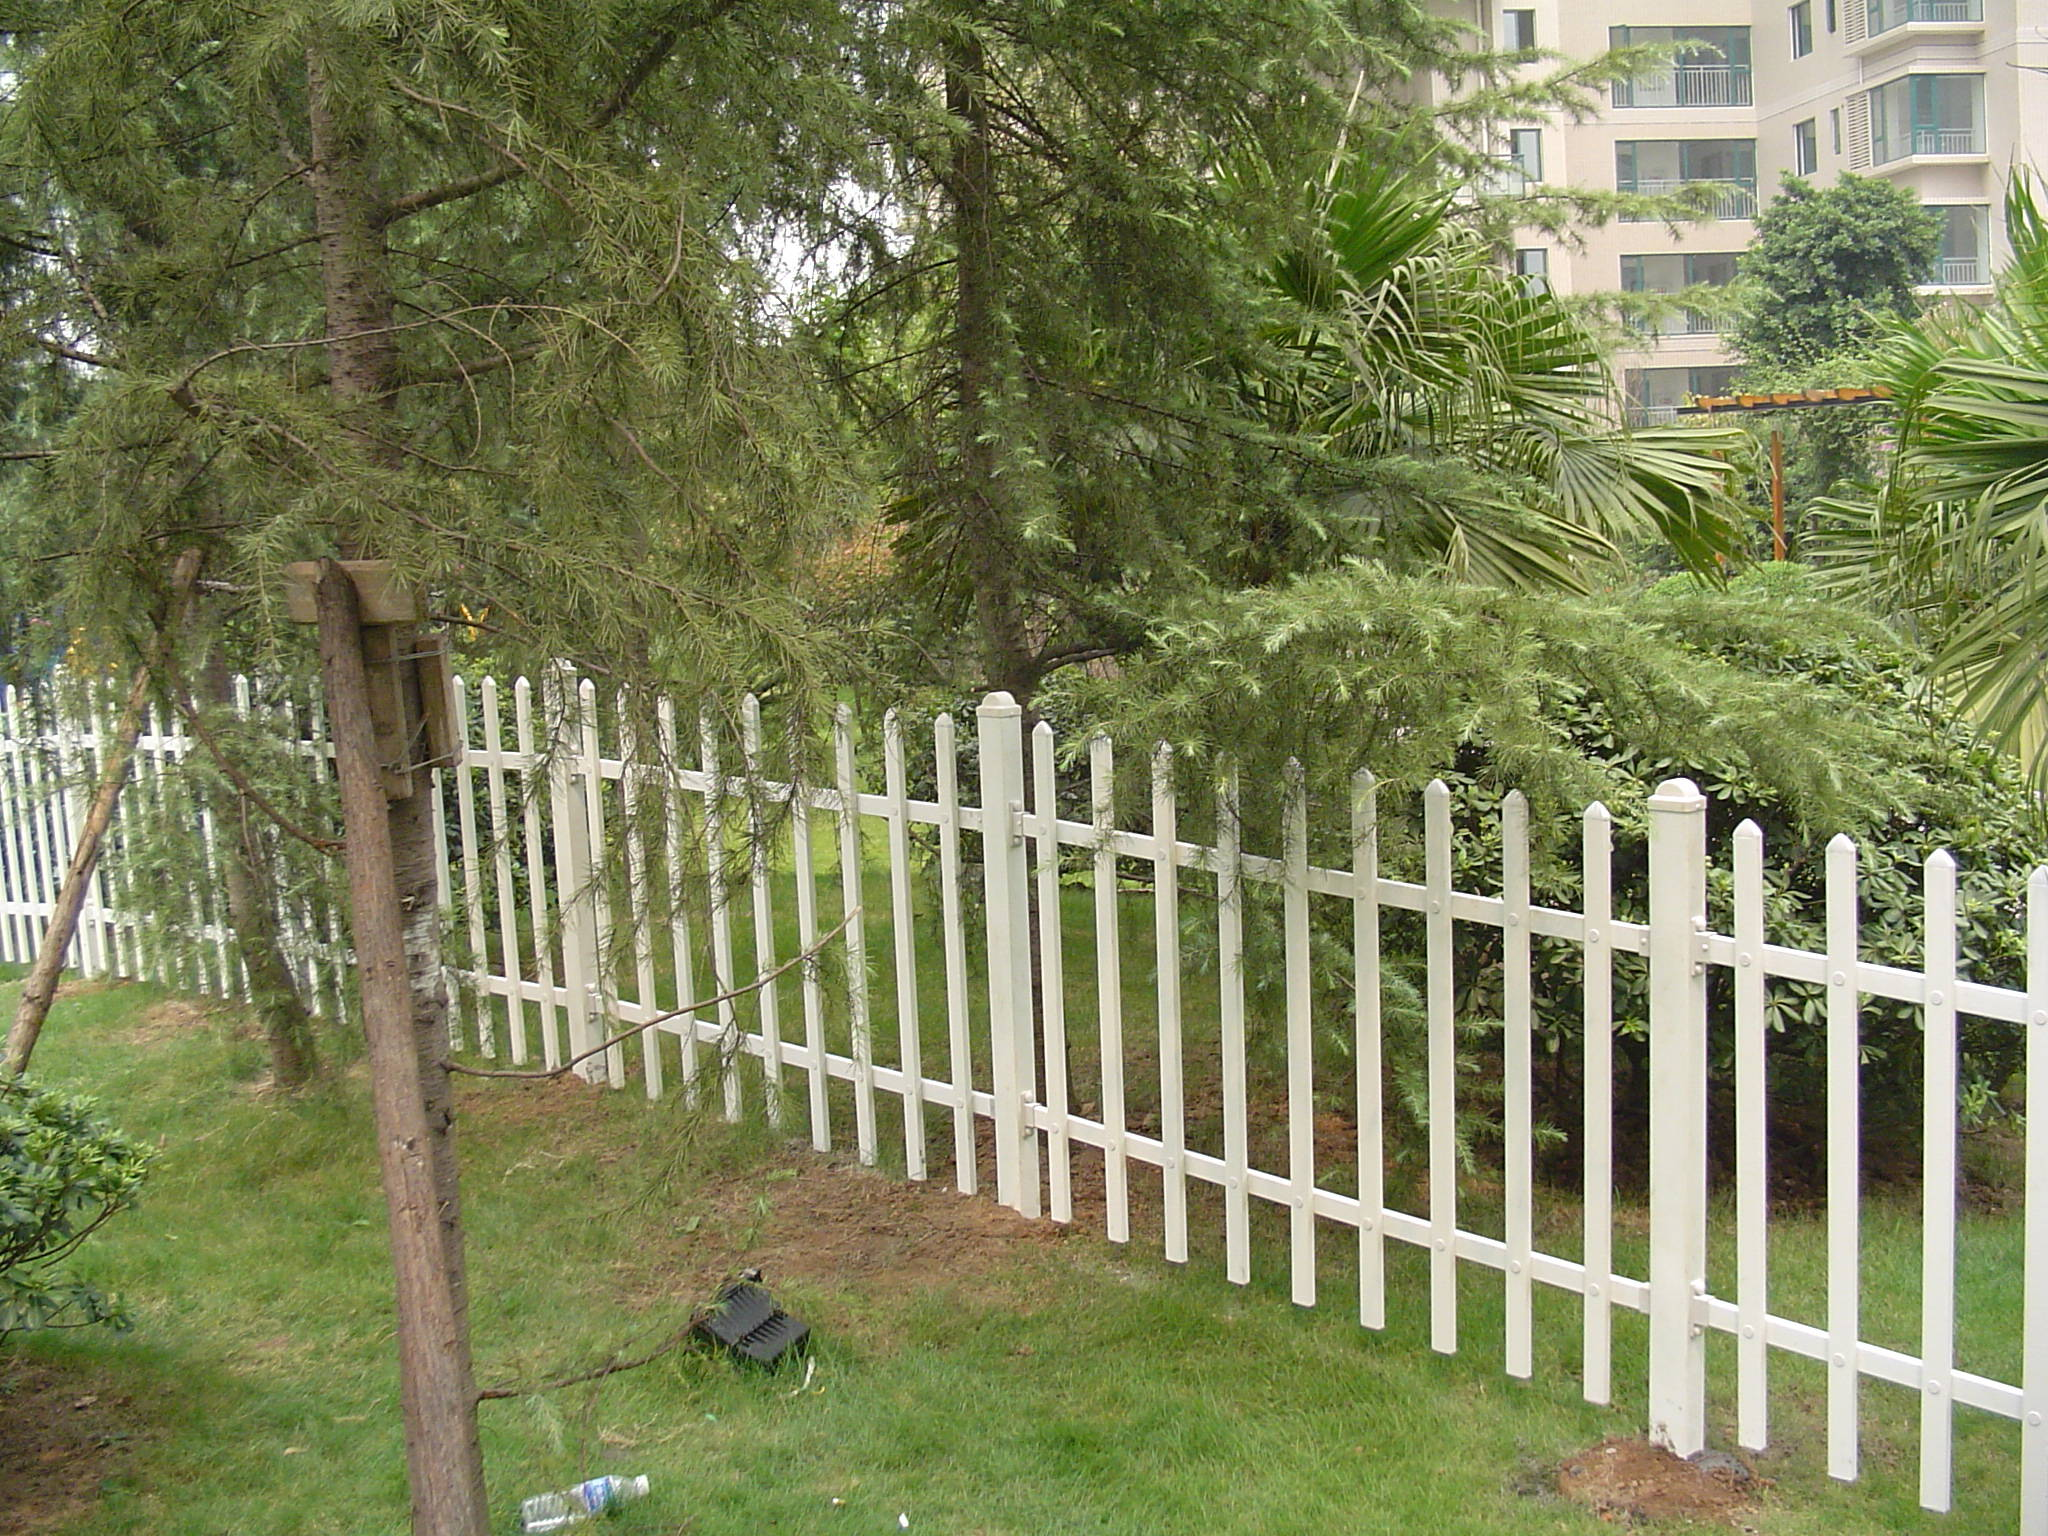 PVC花坛草坪护栏 PVC绿化带围栏 市政道路花坛护栏_顺企网